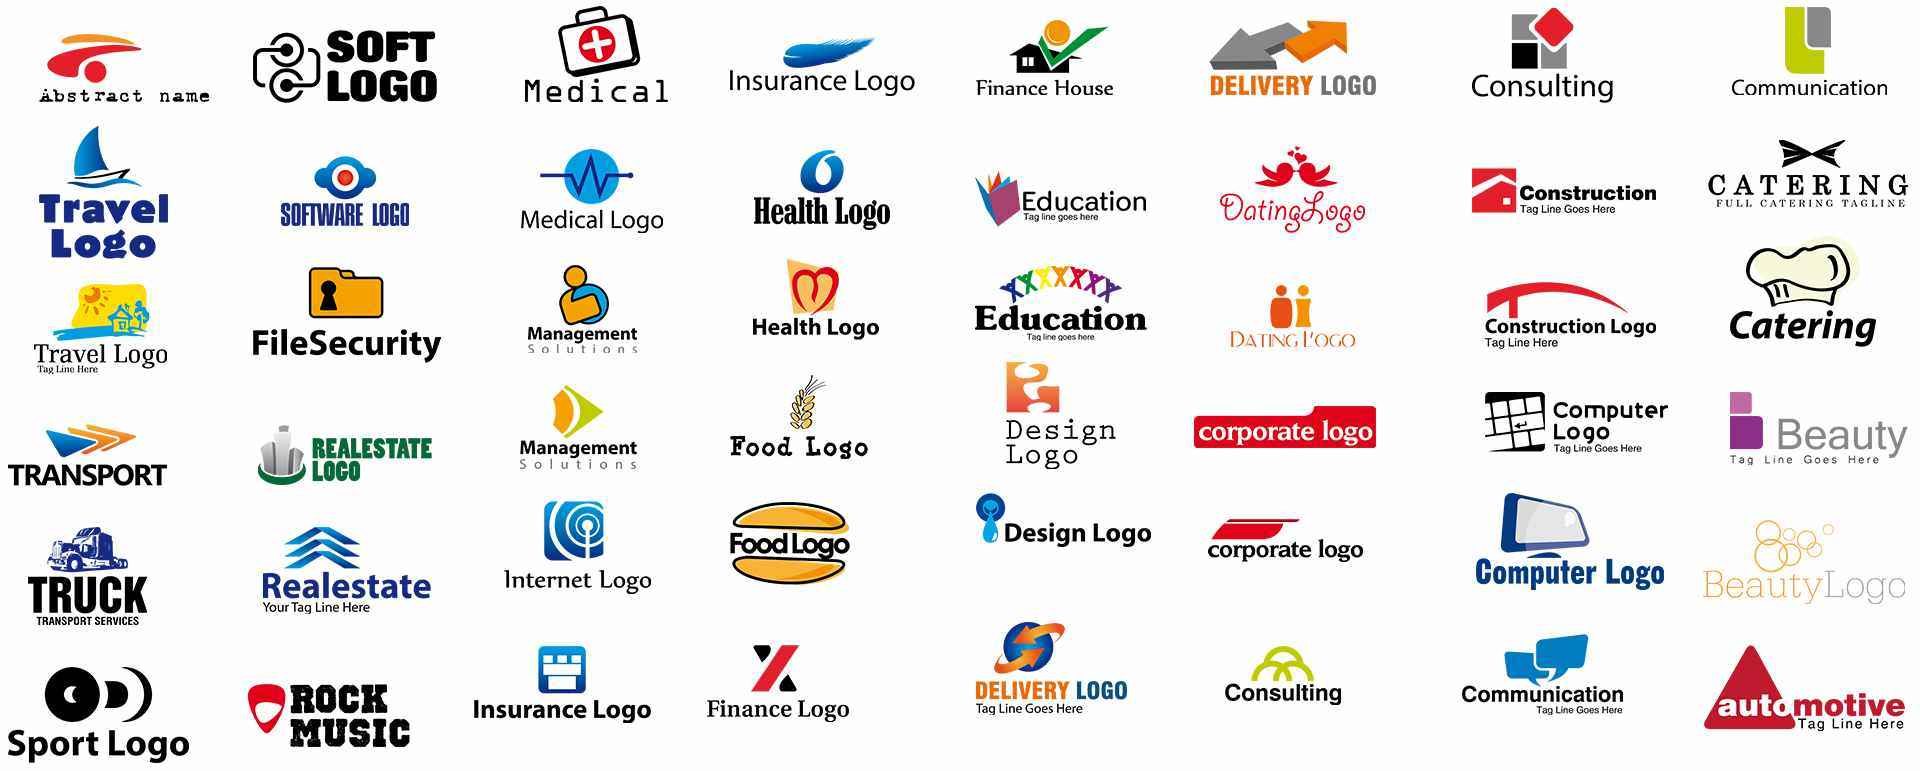 Samples Logo PSD Download Images Free PSD Logo Templates Logos - Free logo design templates psd download